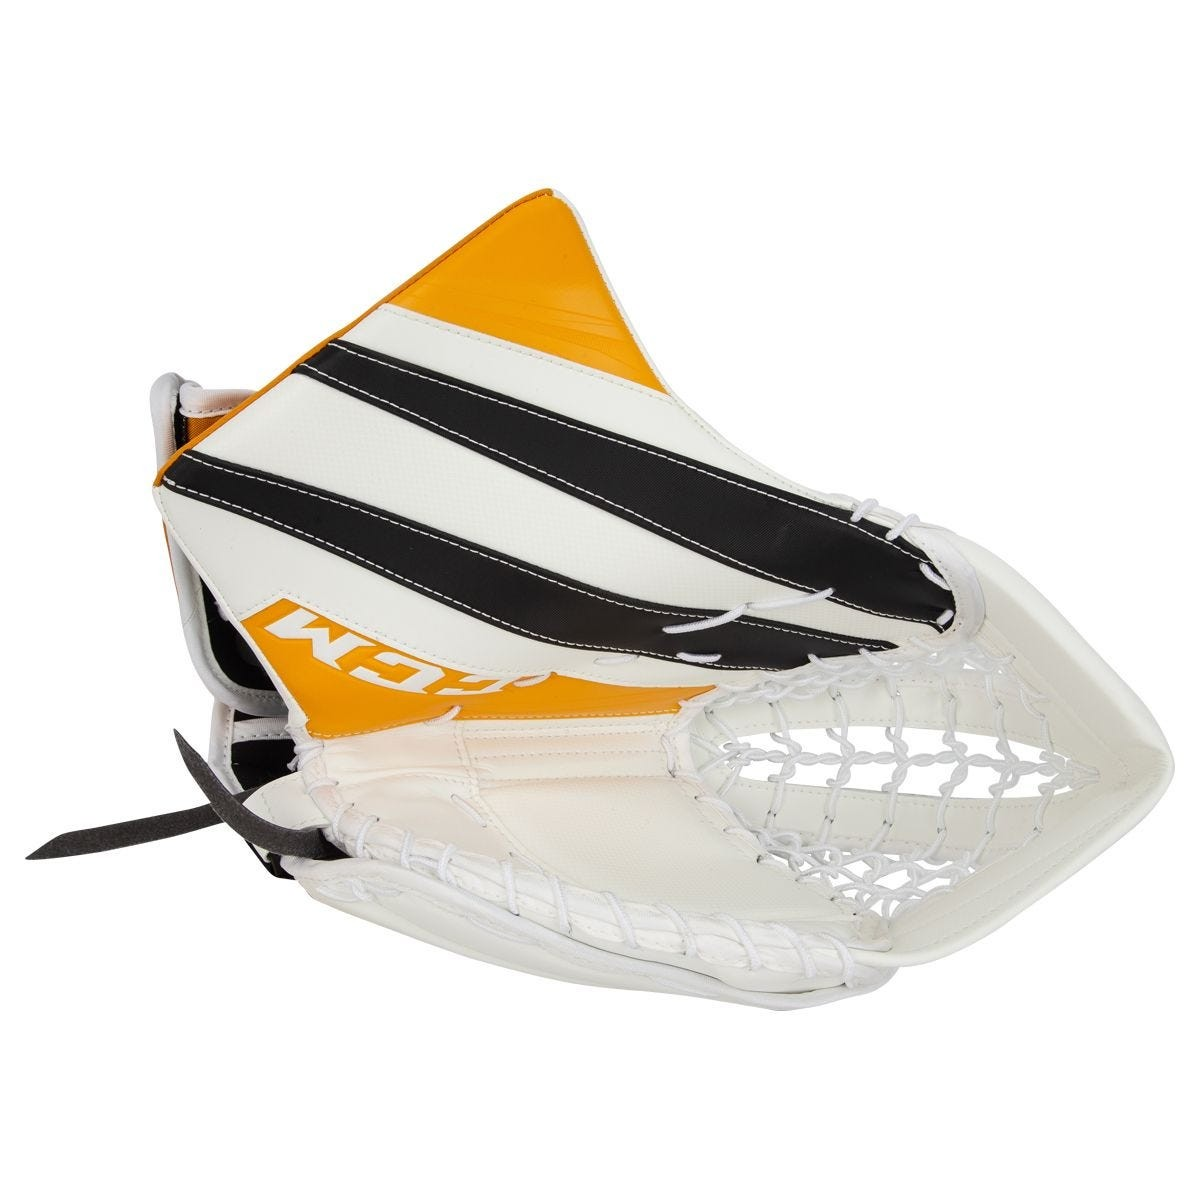 CCM Extreme Flex E5.9 Senior Goalie Glove